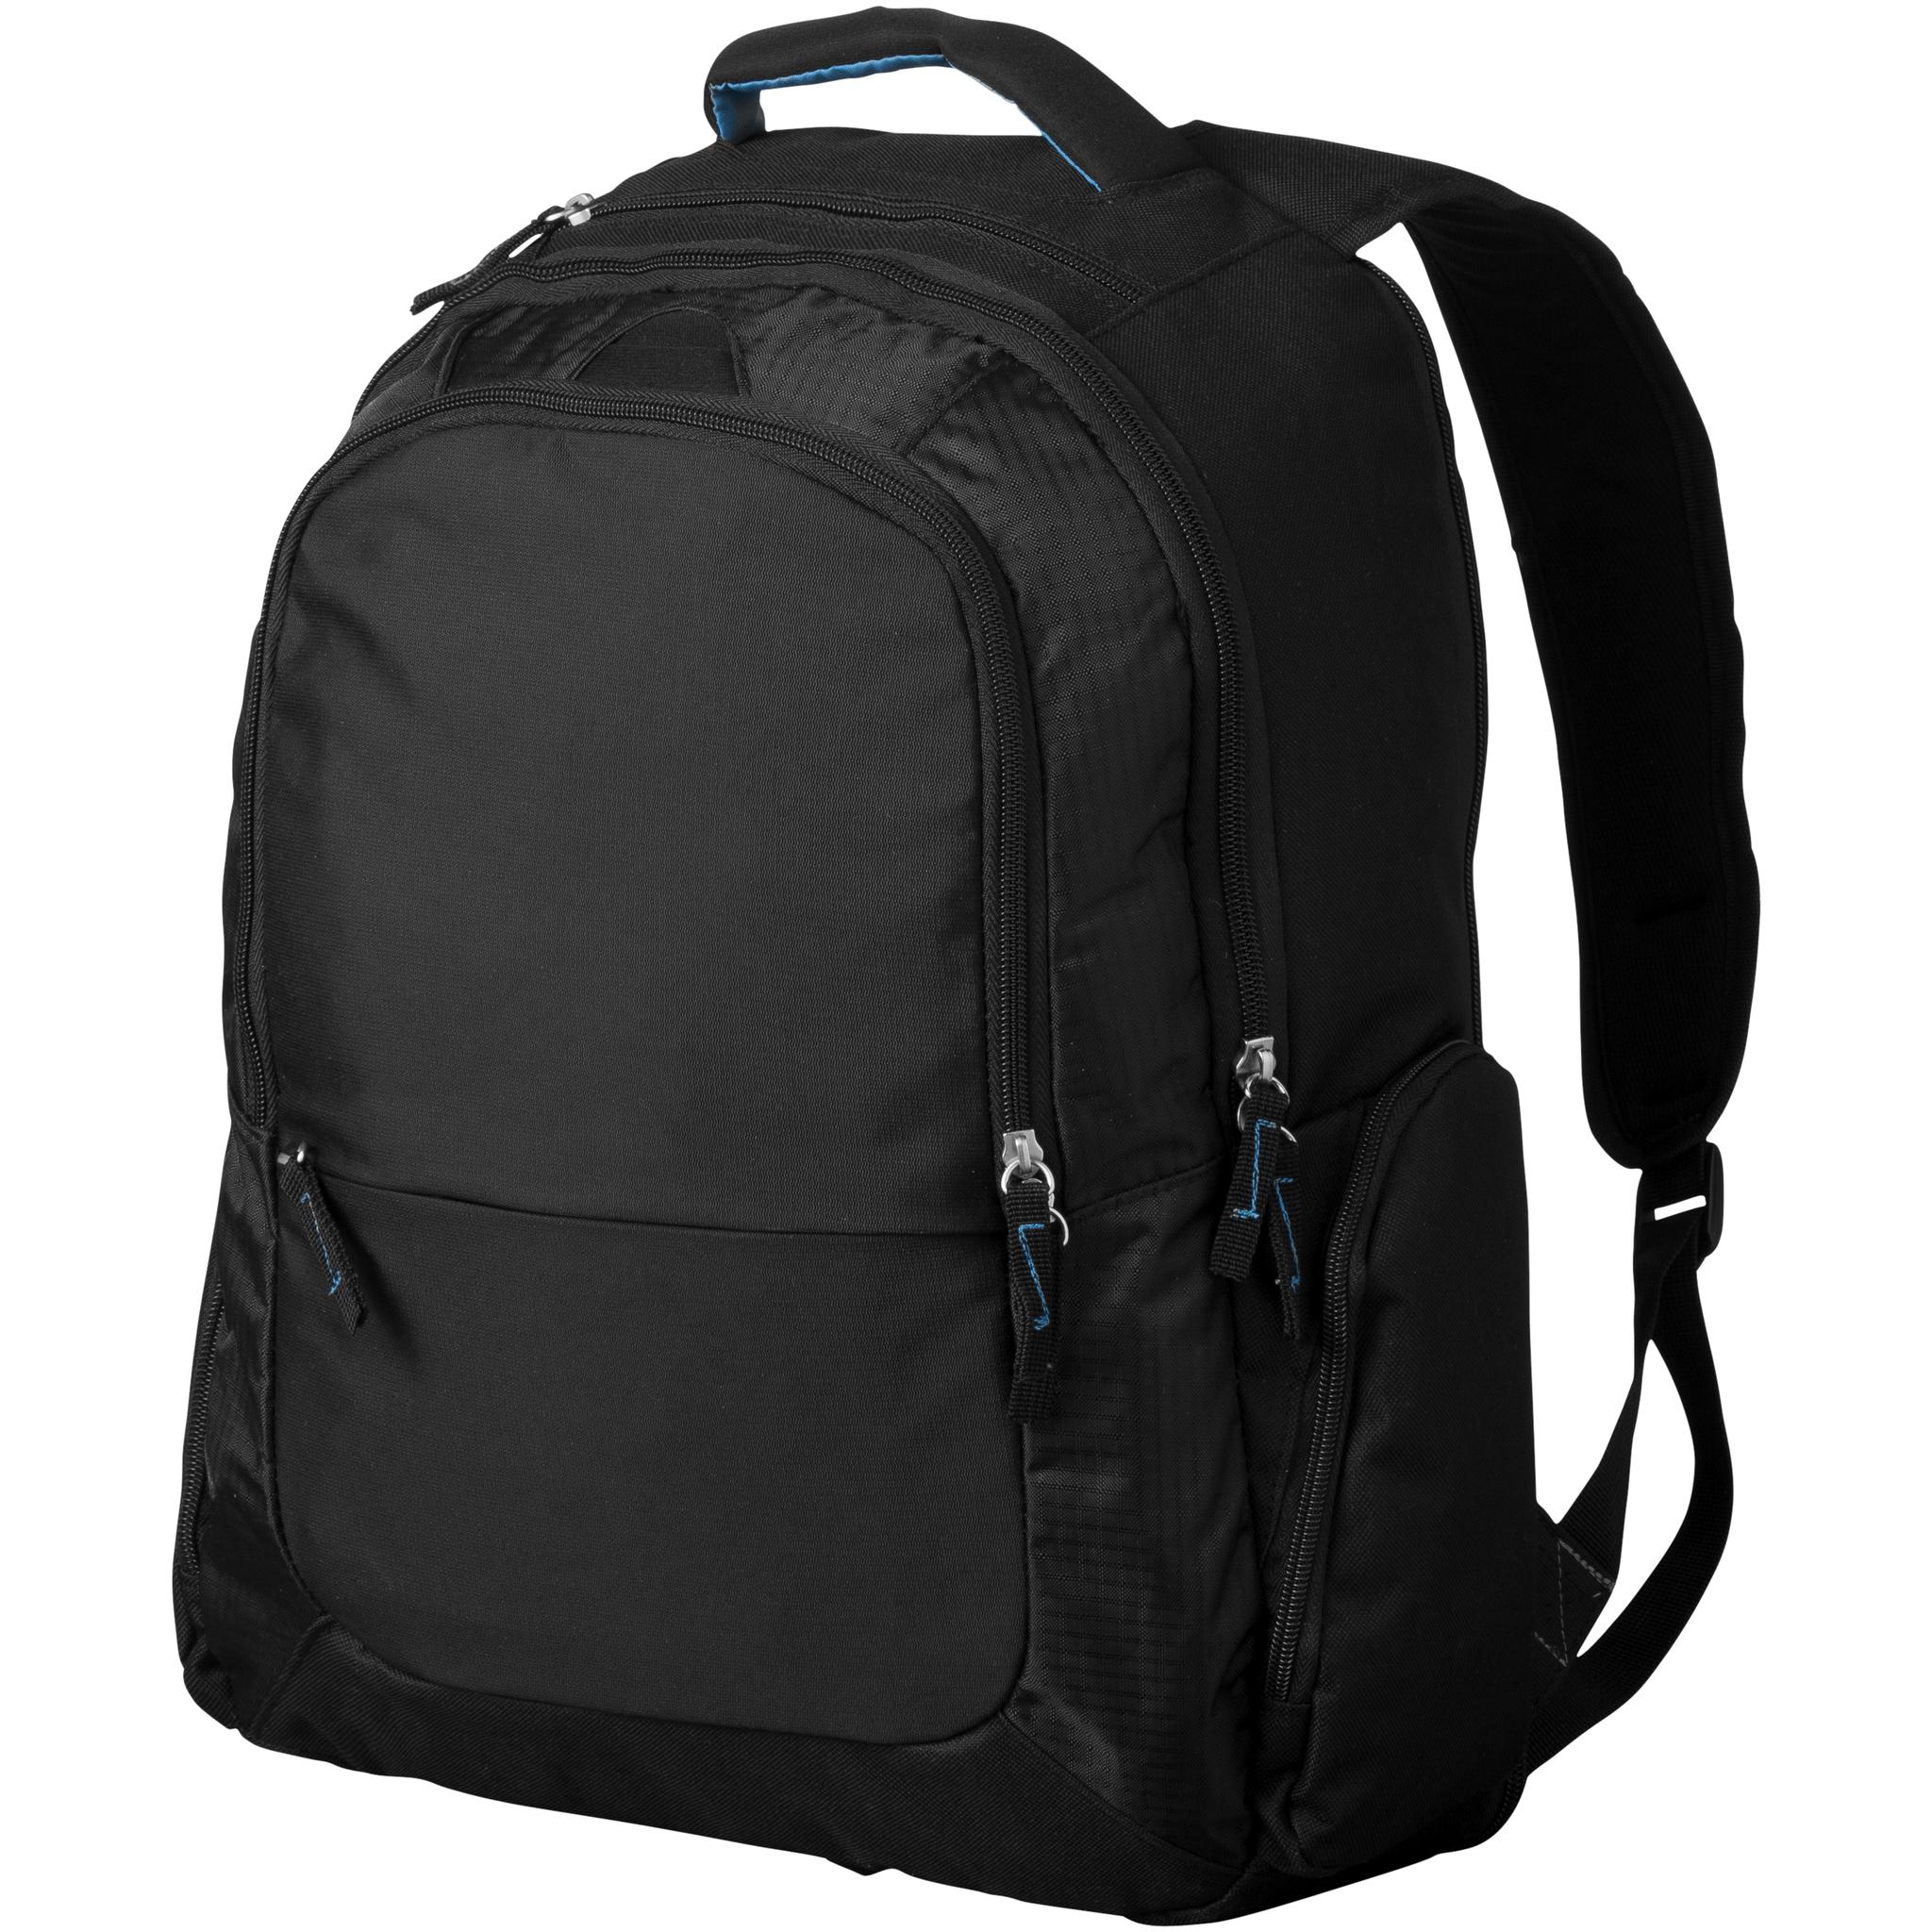 Printed DayTripper 16'' laptop backpack